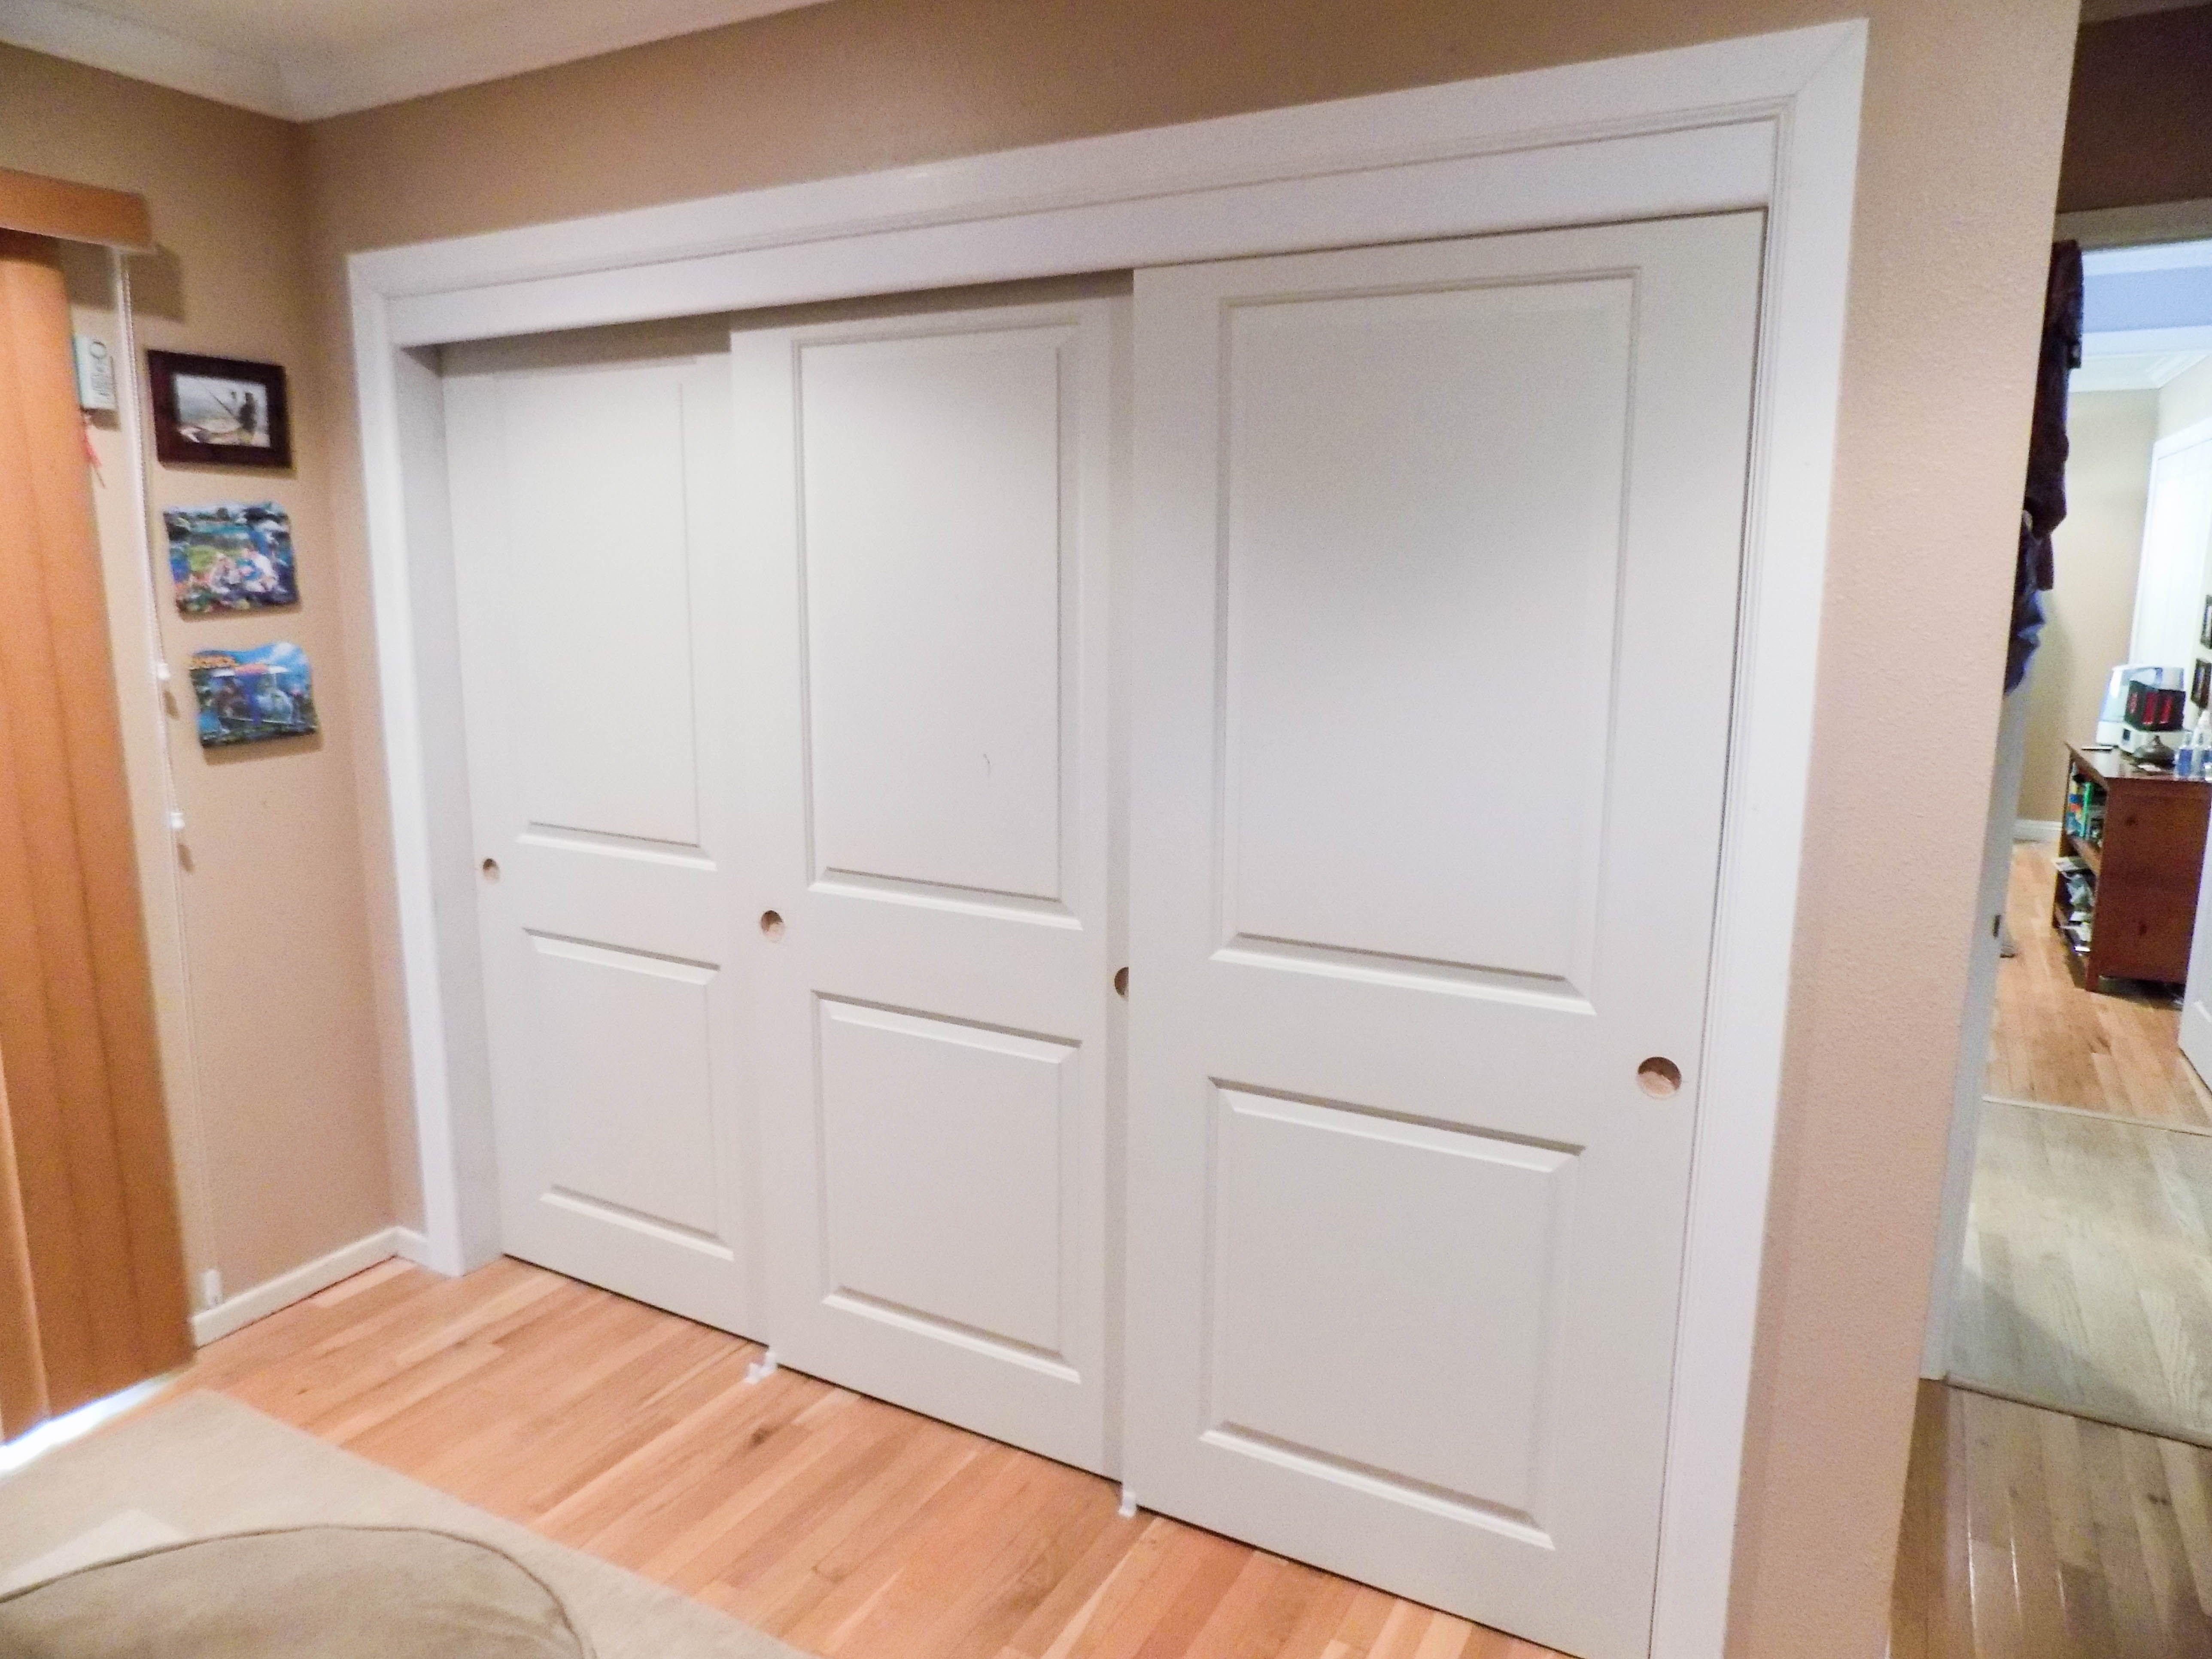 3 Panel 3 Track Top Hung Hollow Core Bypass Closet Doors We Install Closet Doors In Cities Like Rancho Santa Margarita Closet Doors Tall Cabinet Storage Home